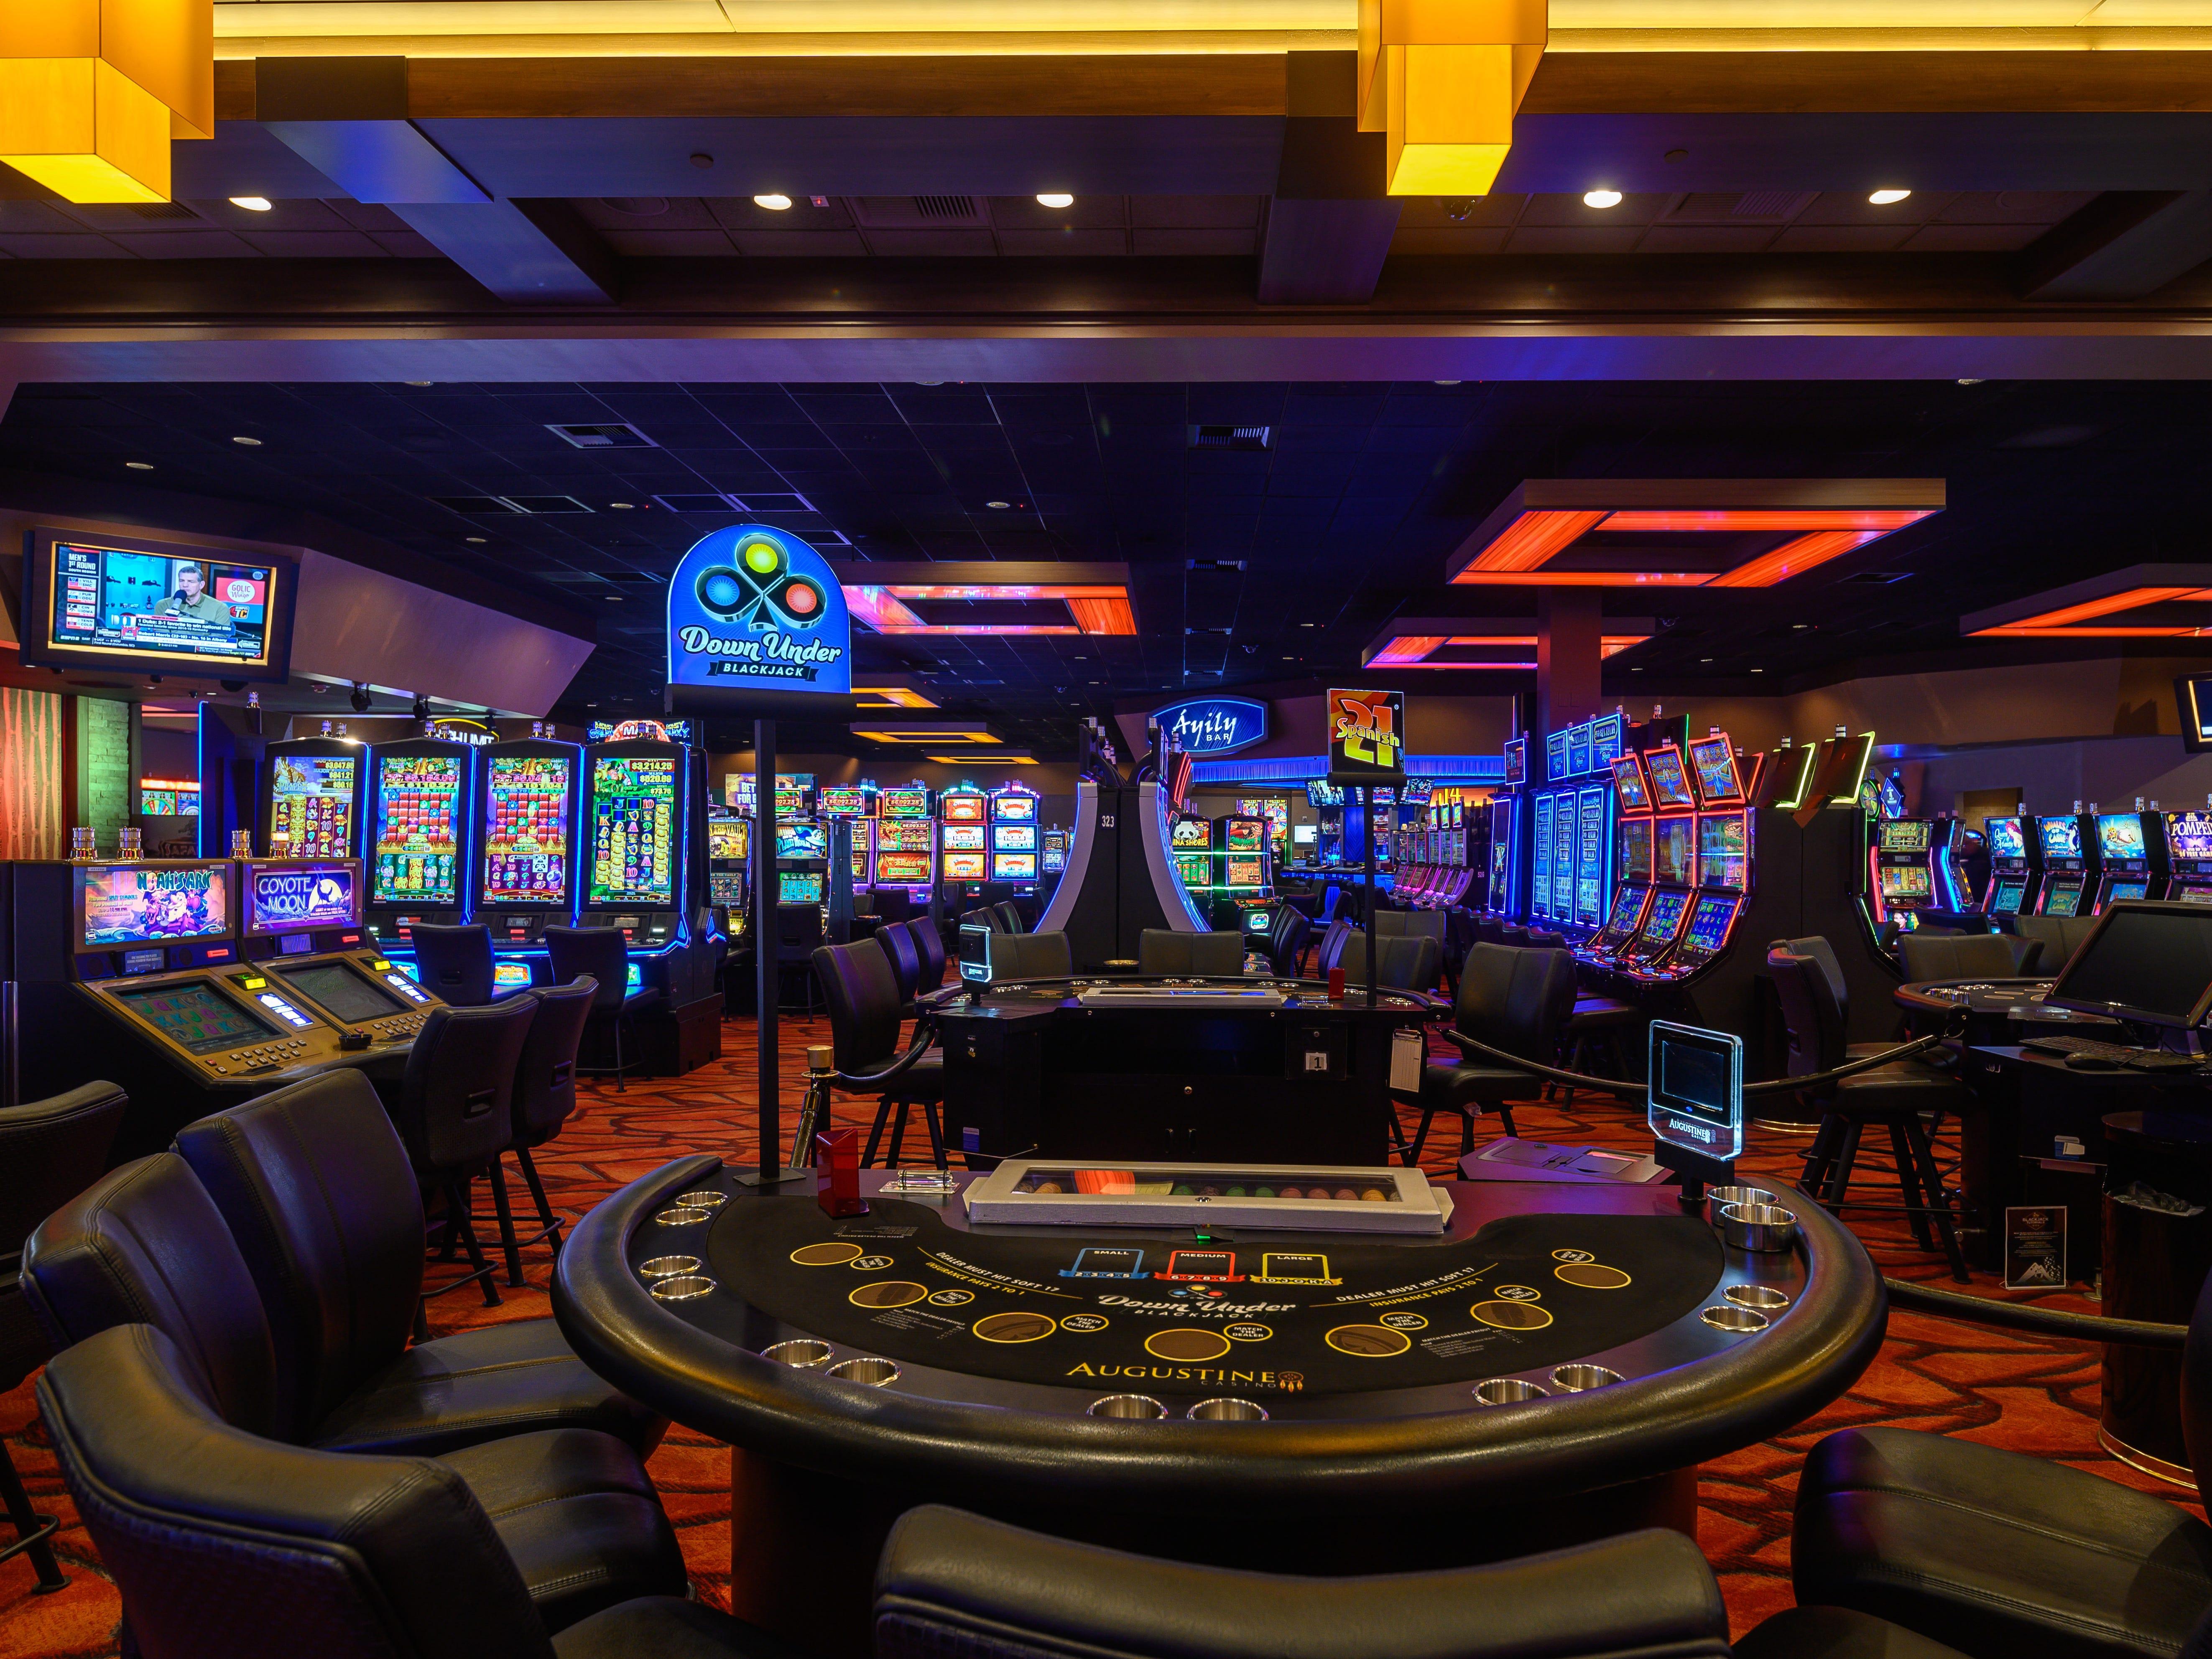 The Augustine Casino in Coachella, Calif.